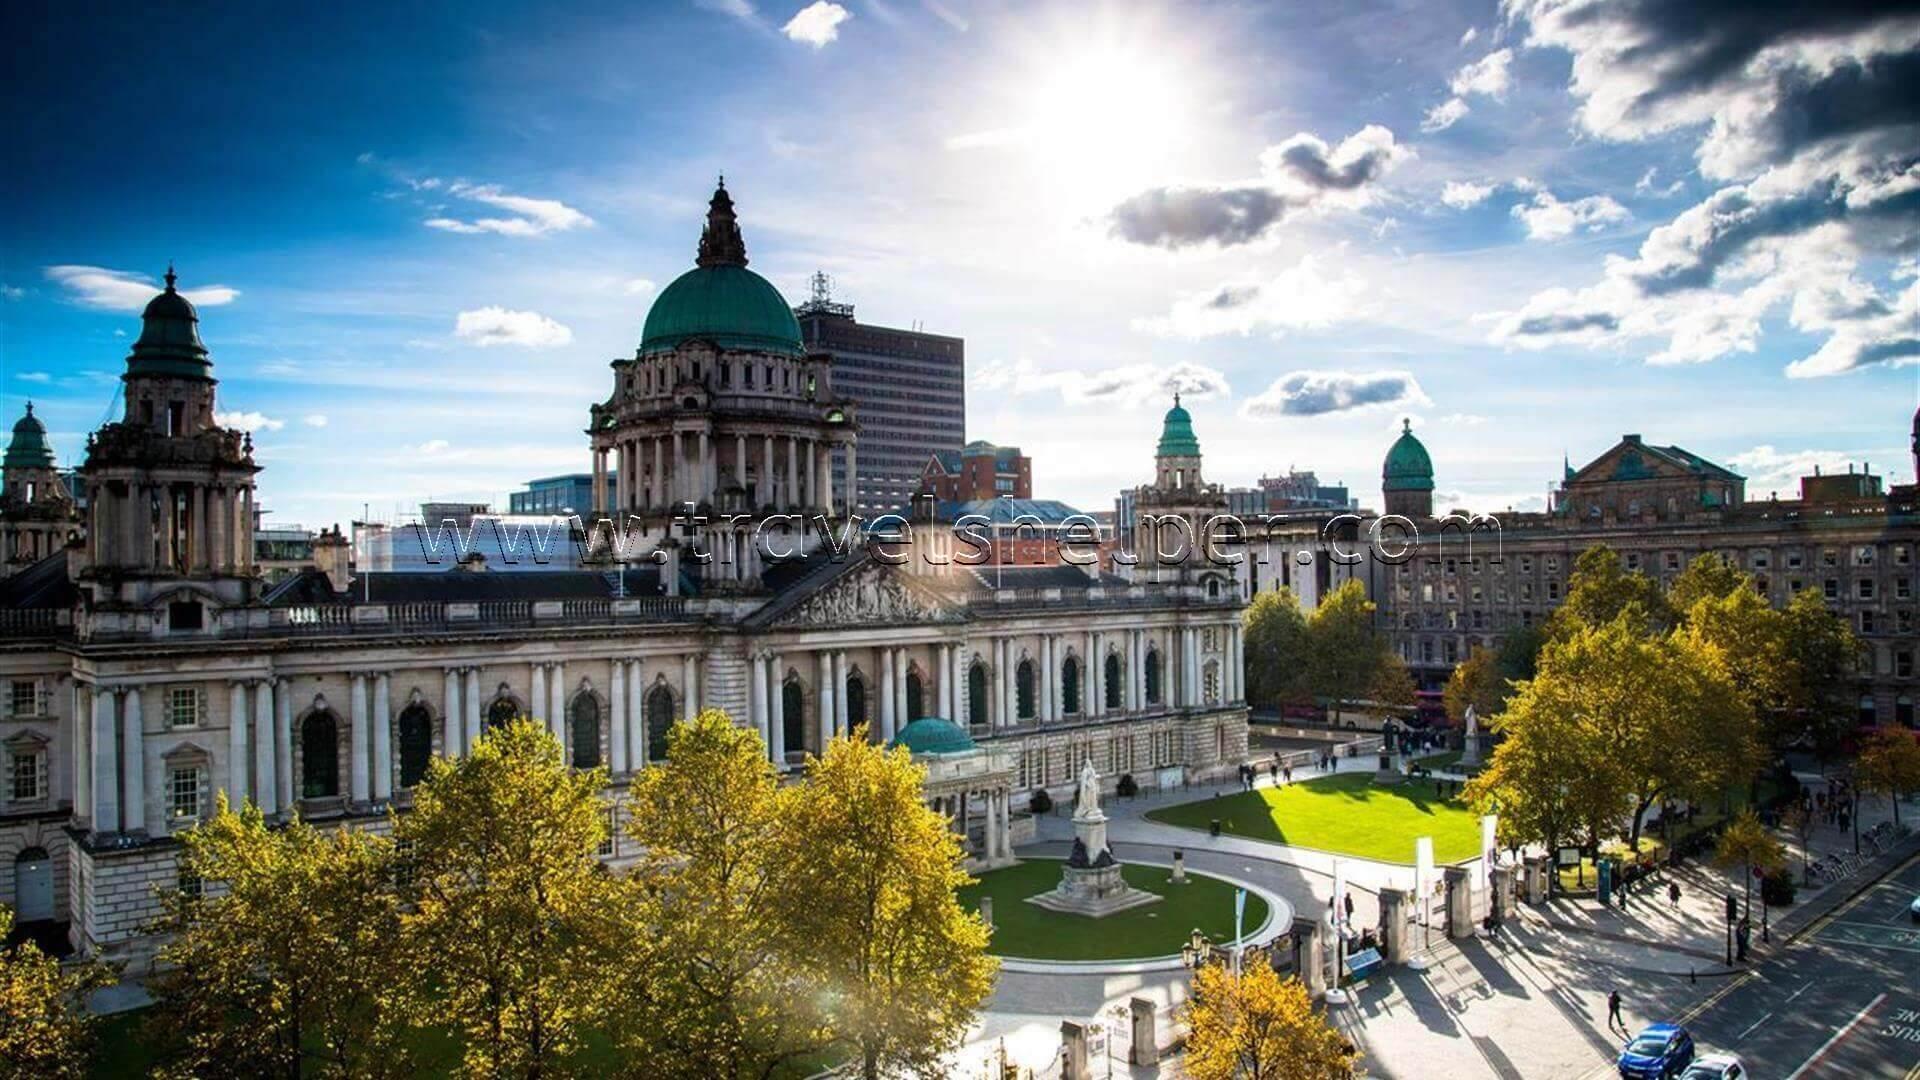 Belfast, Northern Ireland - 10 WONDERFUL CITIES IN EUROPE THAT TOURISTS OVERLOOK